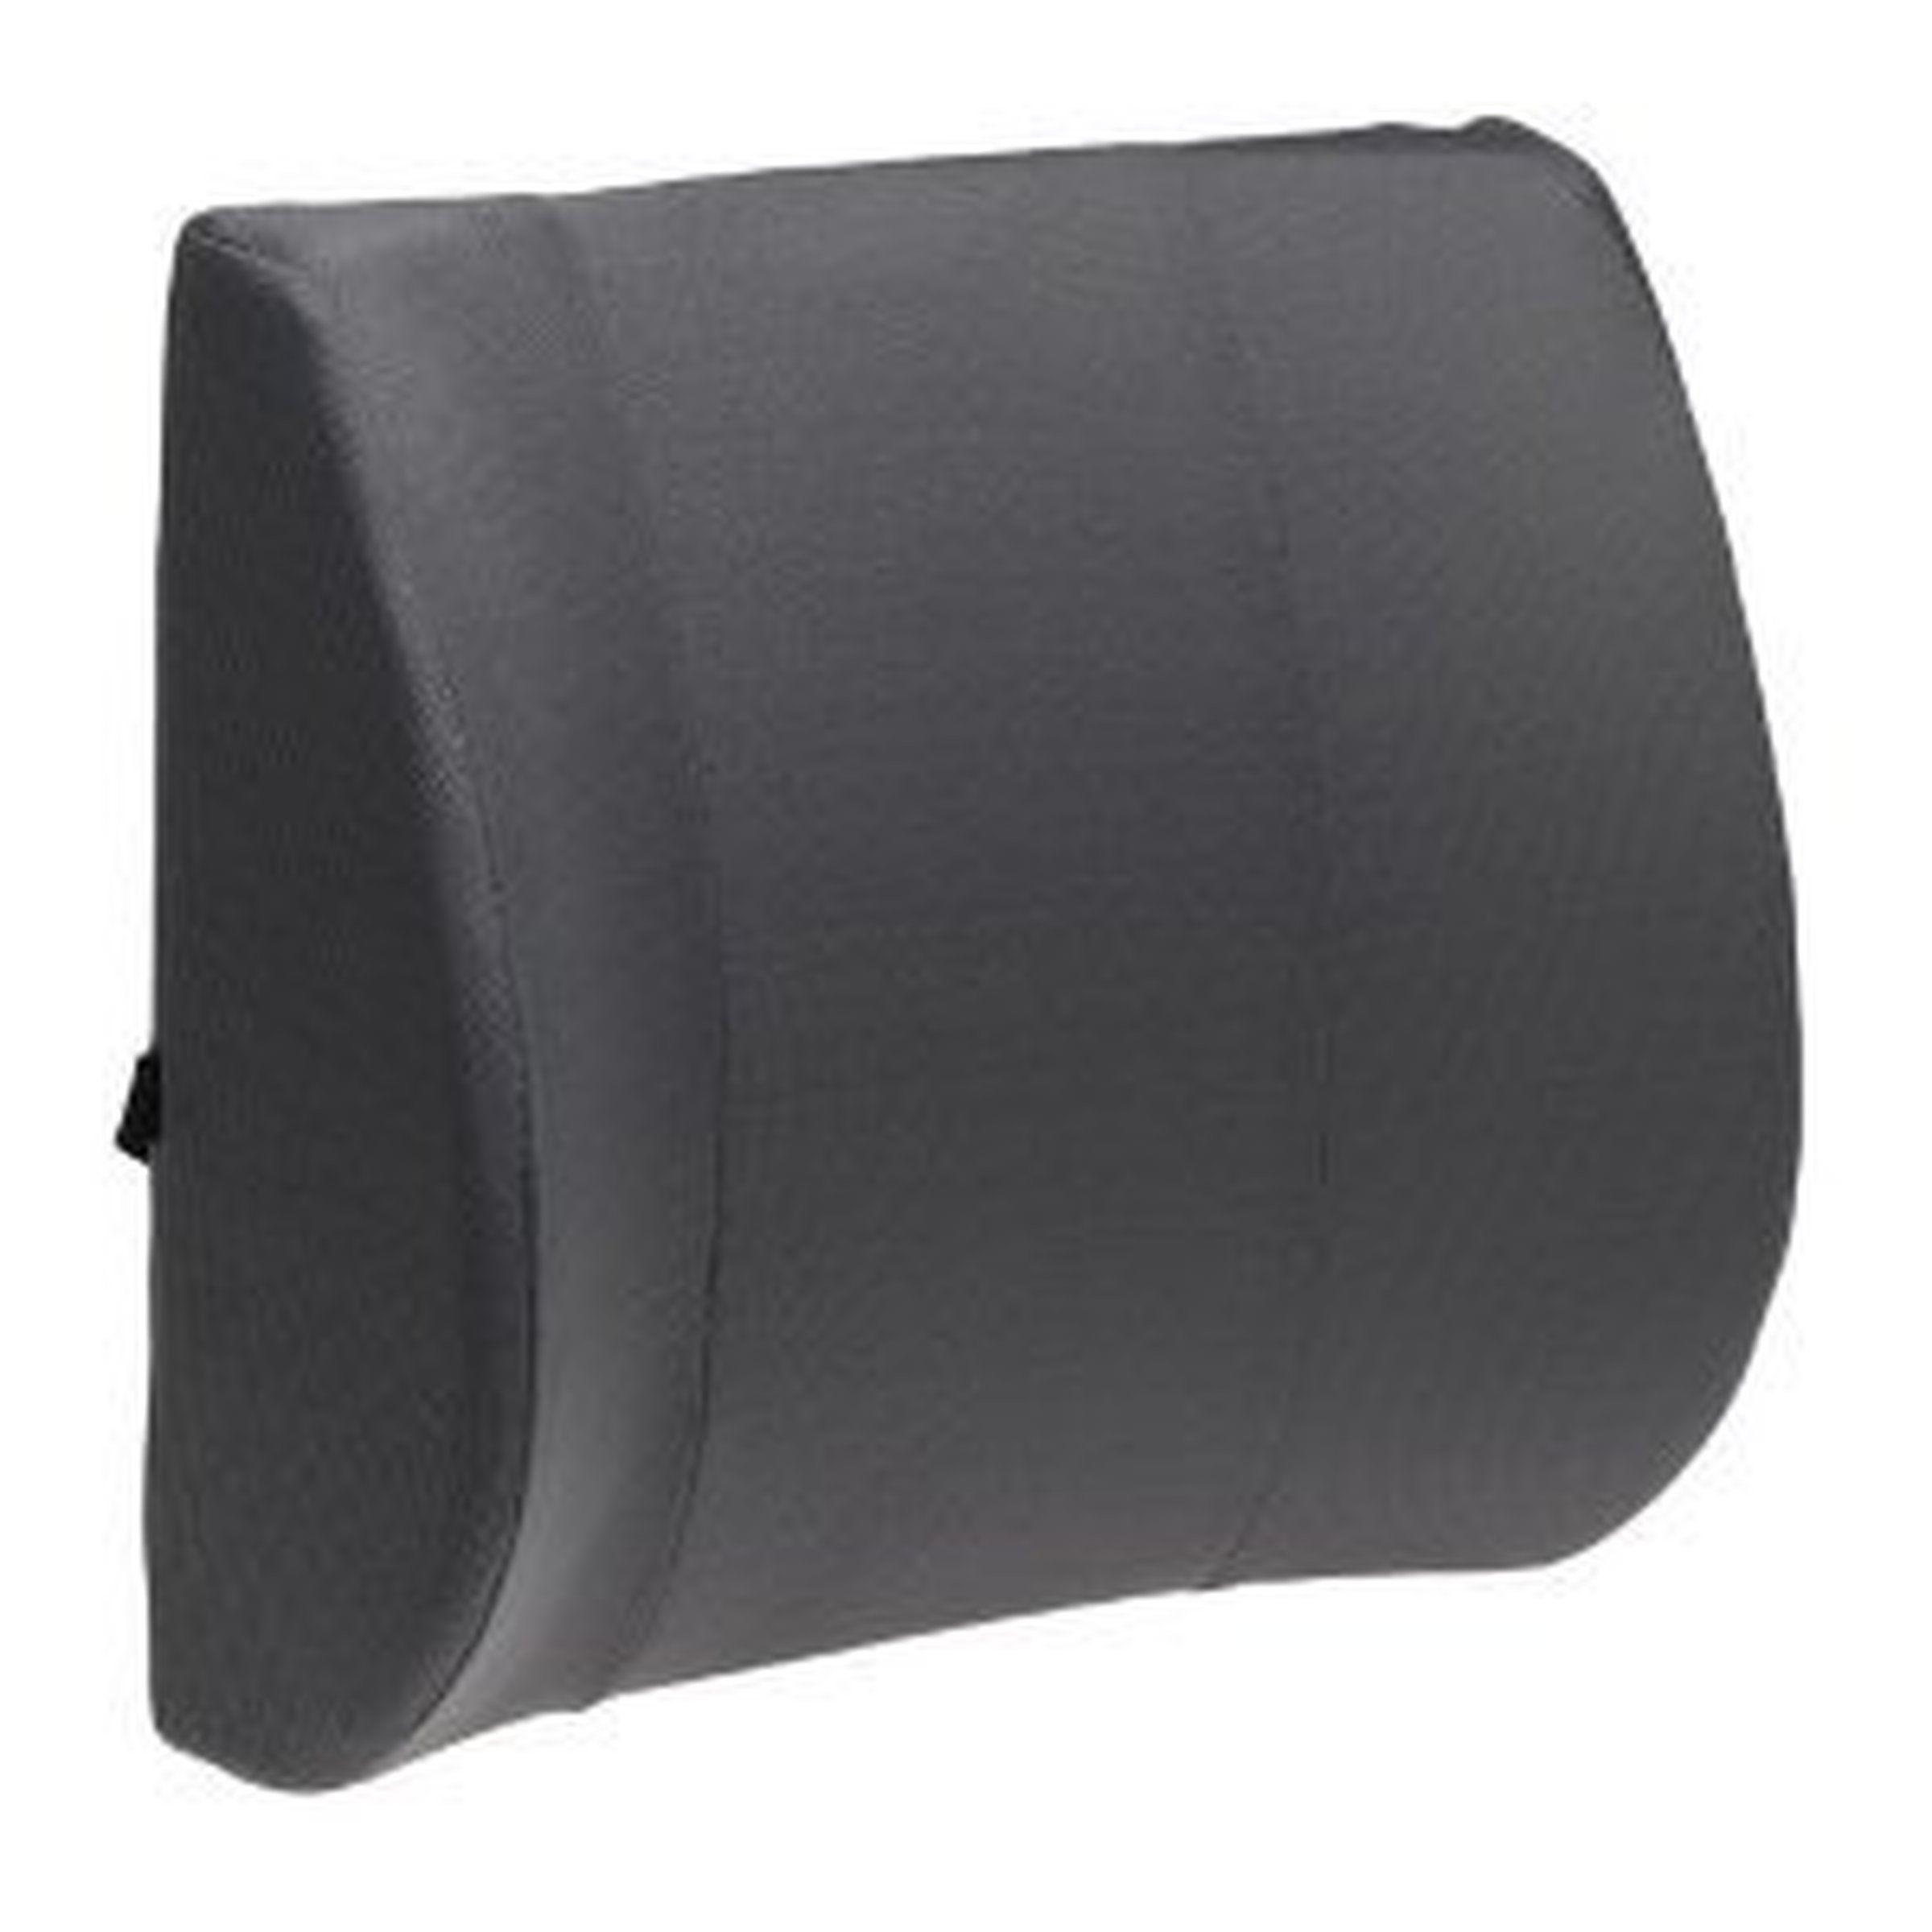 Lumbar Support Cushion For Chair Lendenkissen Kissen Und